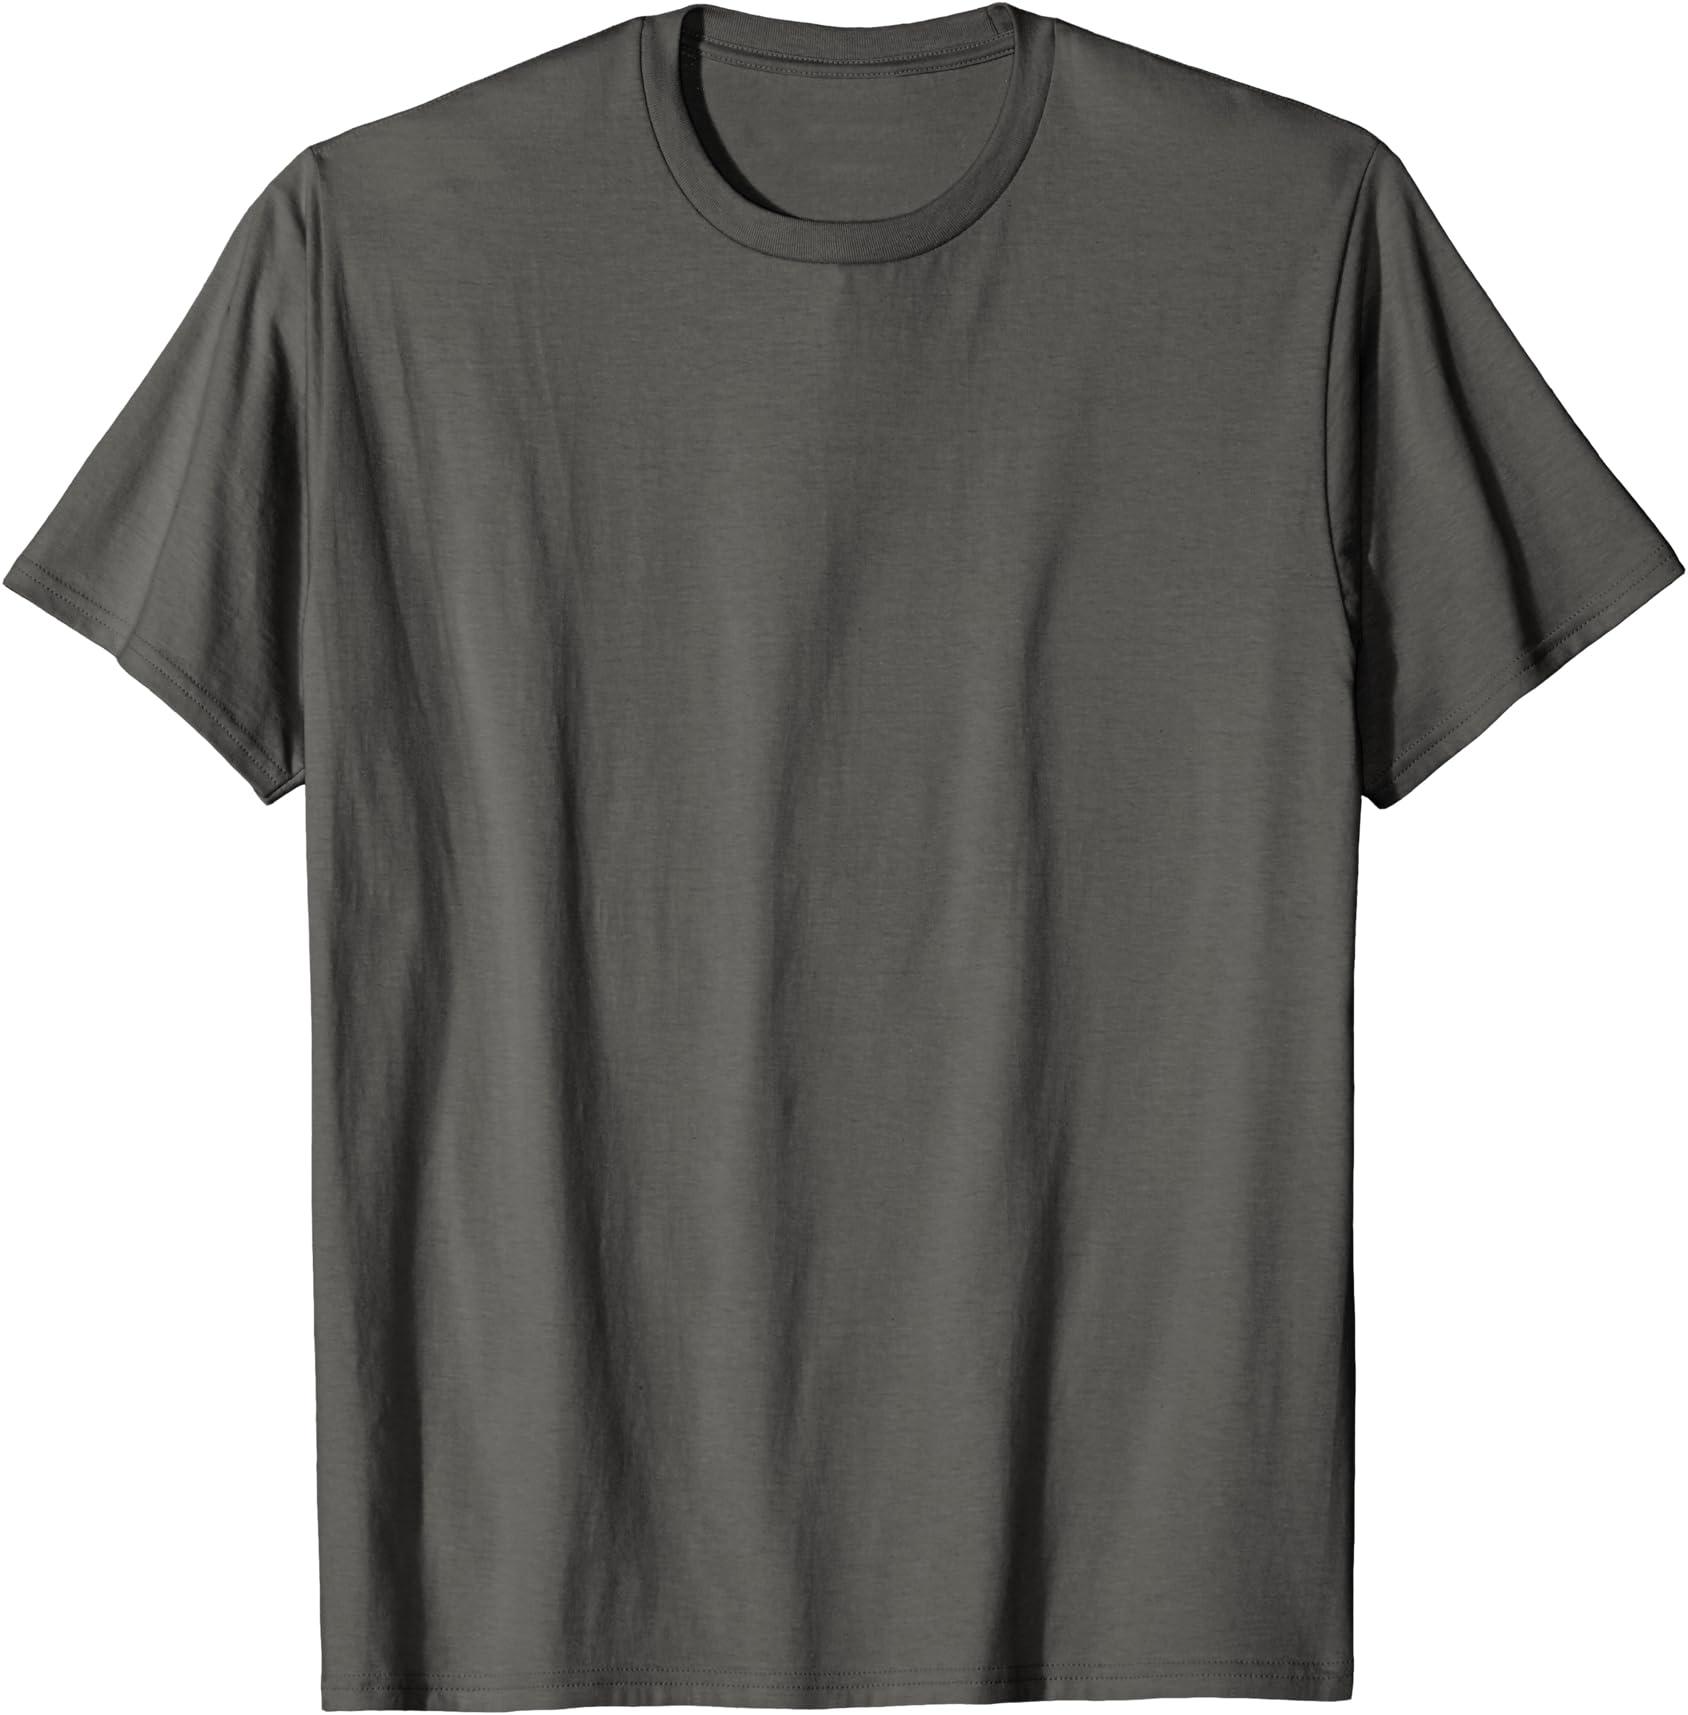 Halloween Jac-k Skull Moon Kids T-Shirts Short Sleeve Tees Summer Tops for Youth//Boys//Girls